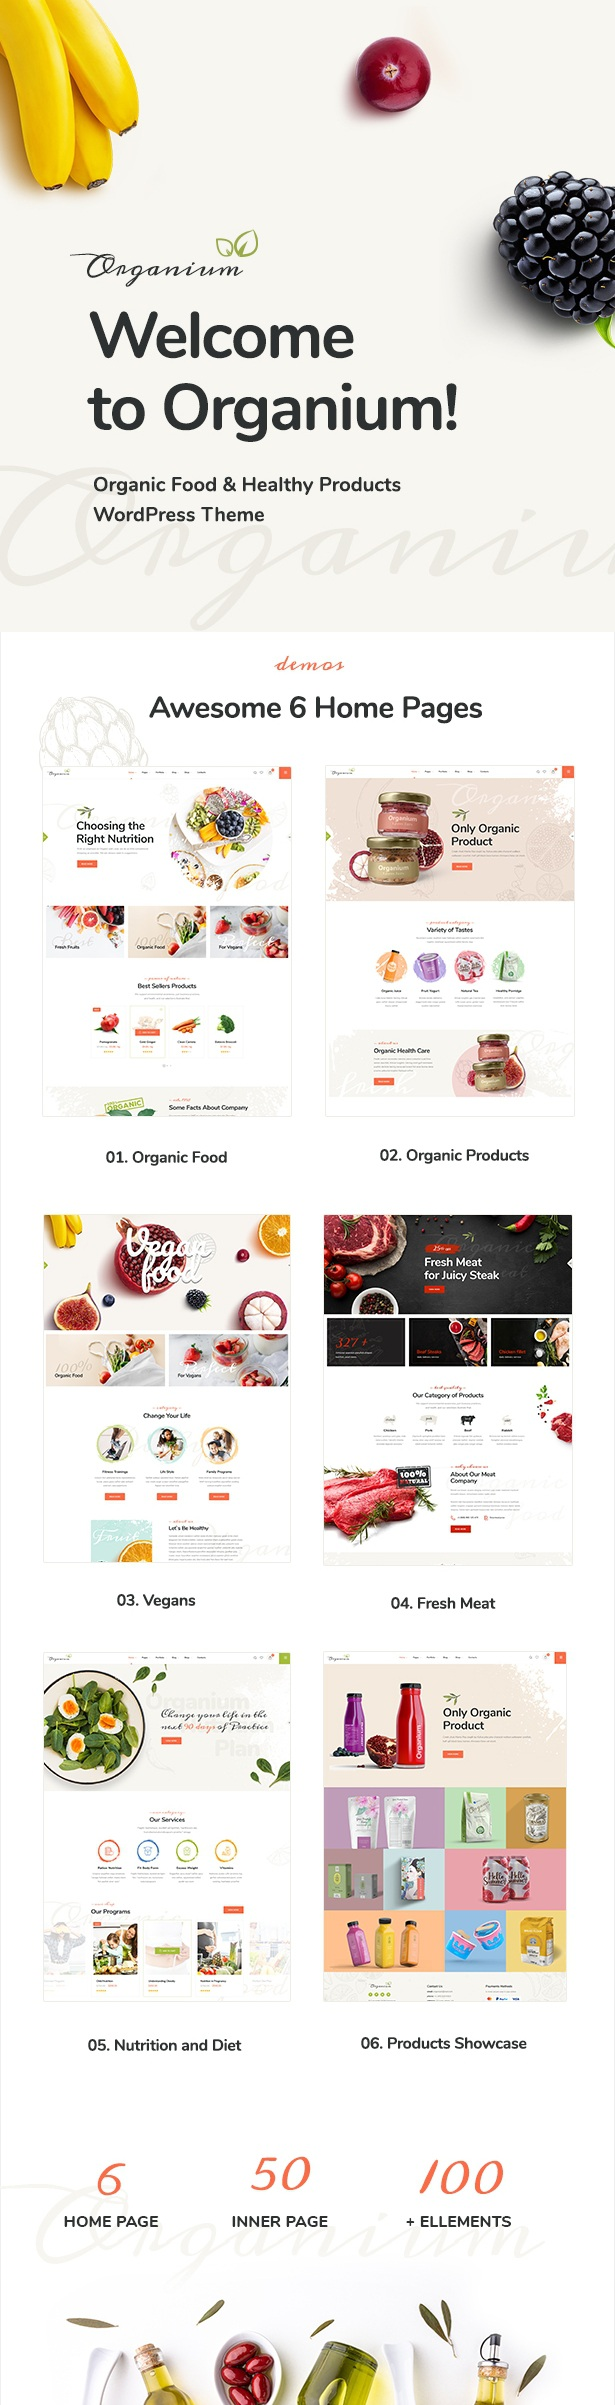 Organic Food Products WordPress Theme